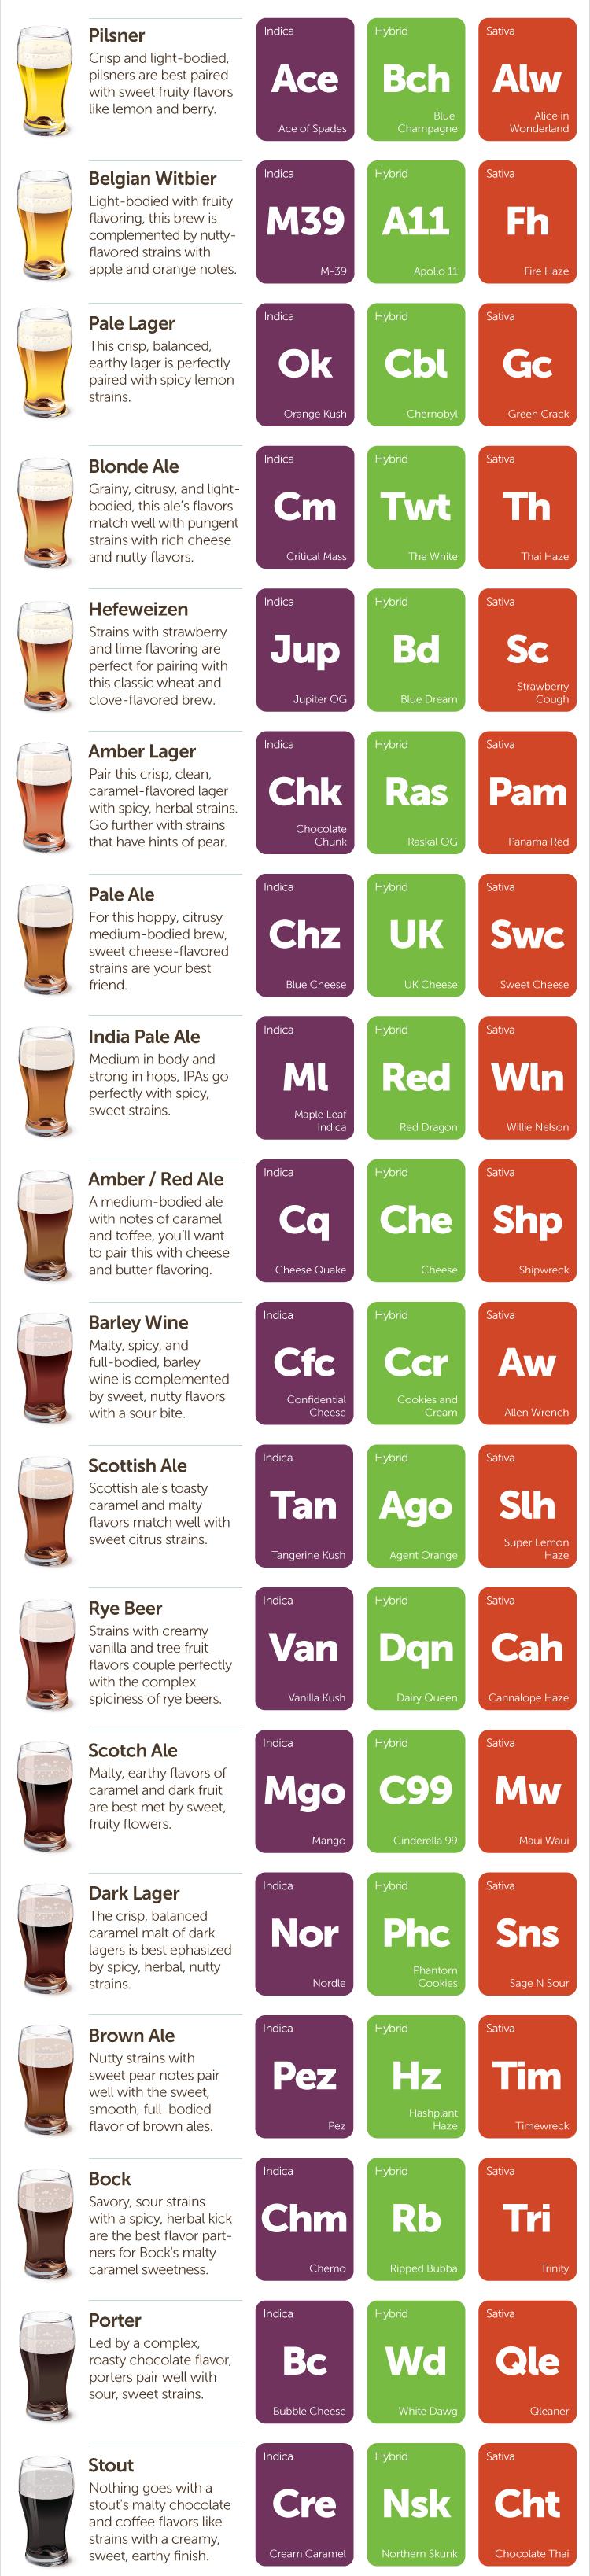 Infografía maridajes cerveza con marihuana